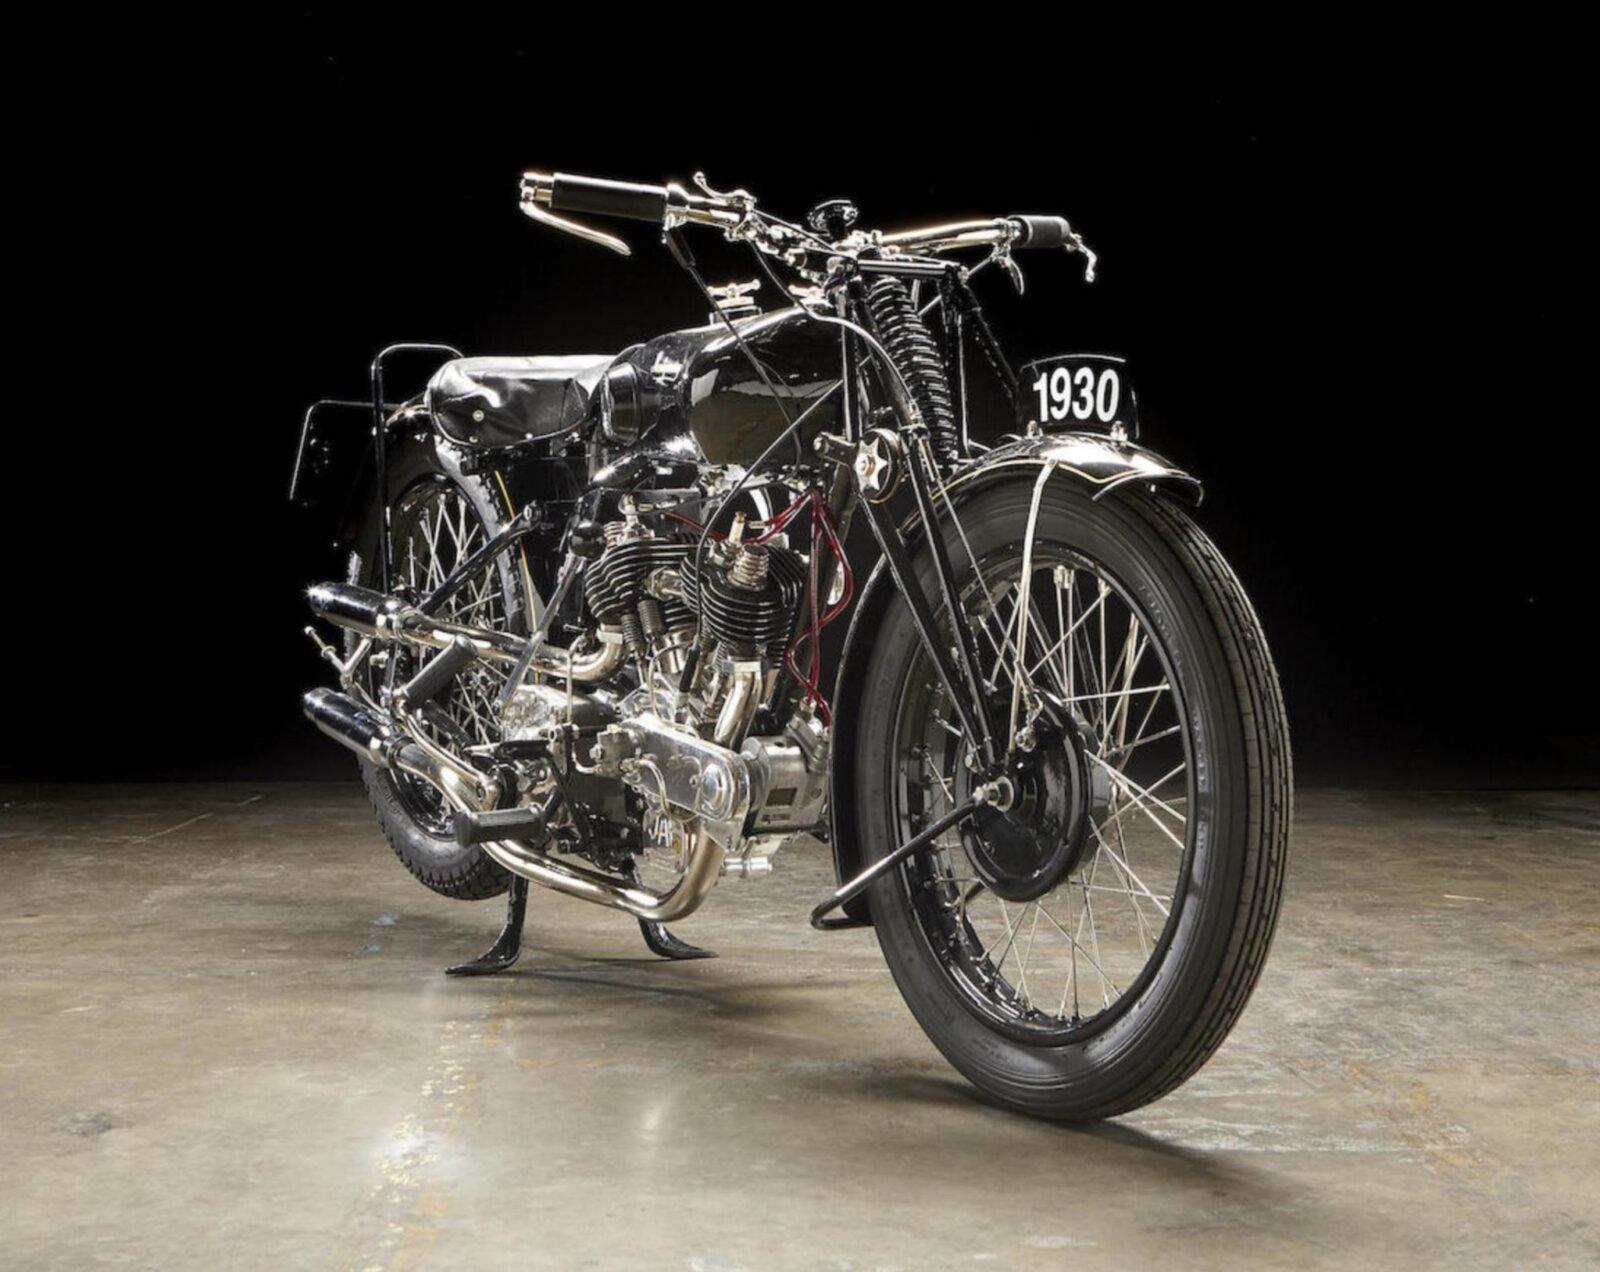 Montgomery JAP Motorcycle 7 1600x1272 - 1930 Montgomery JAP 750